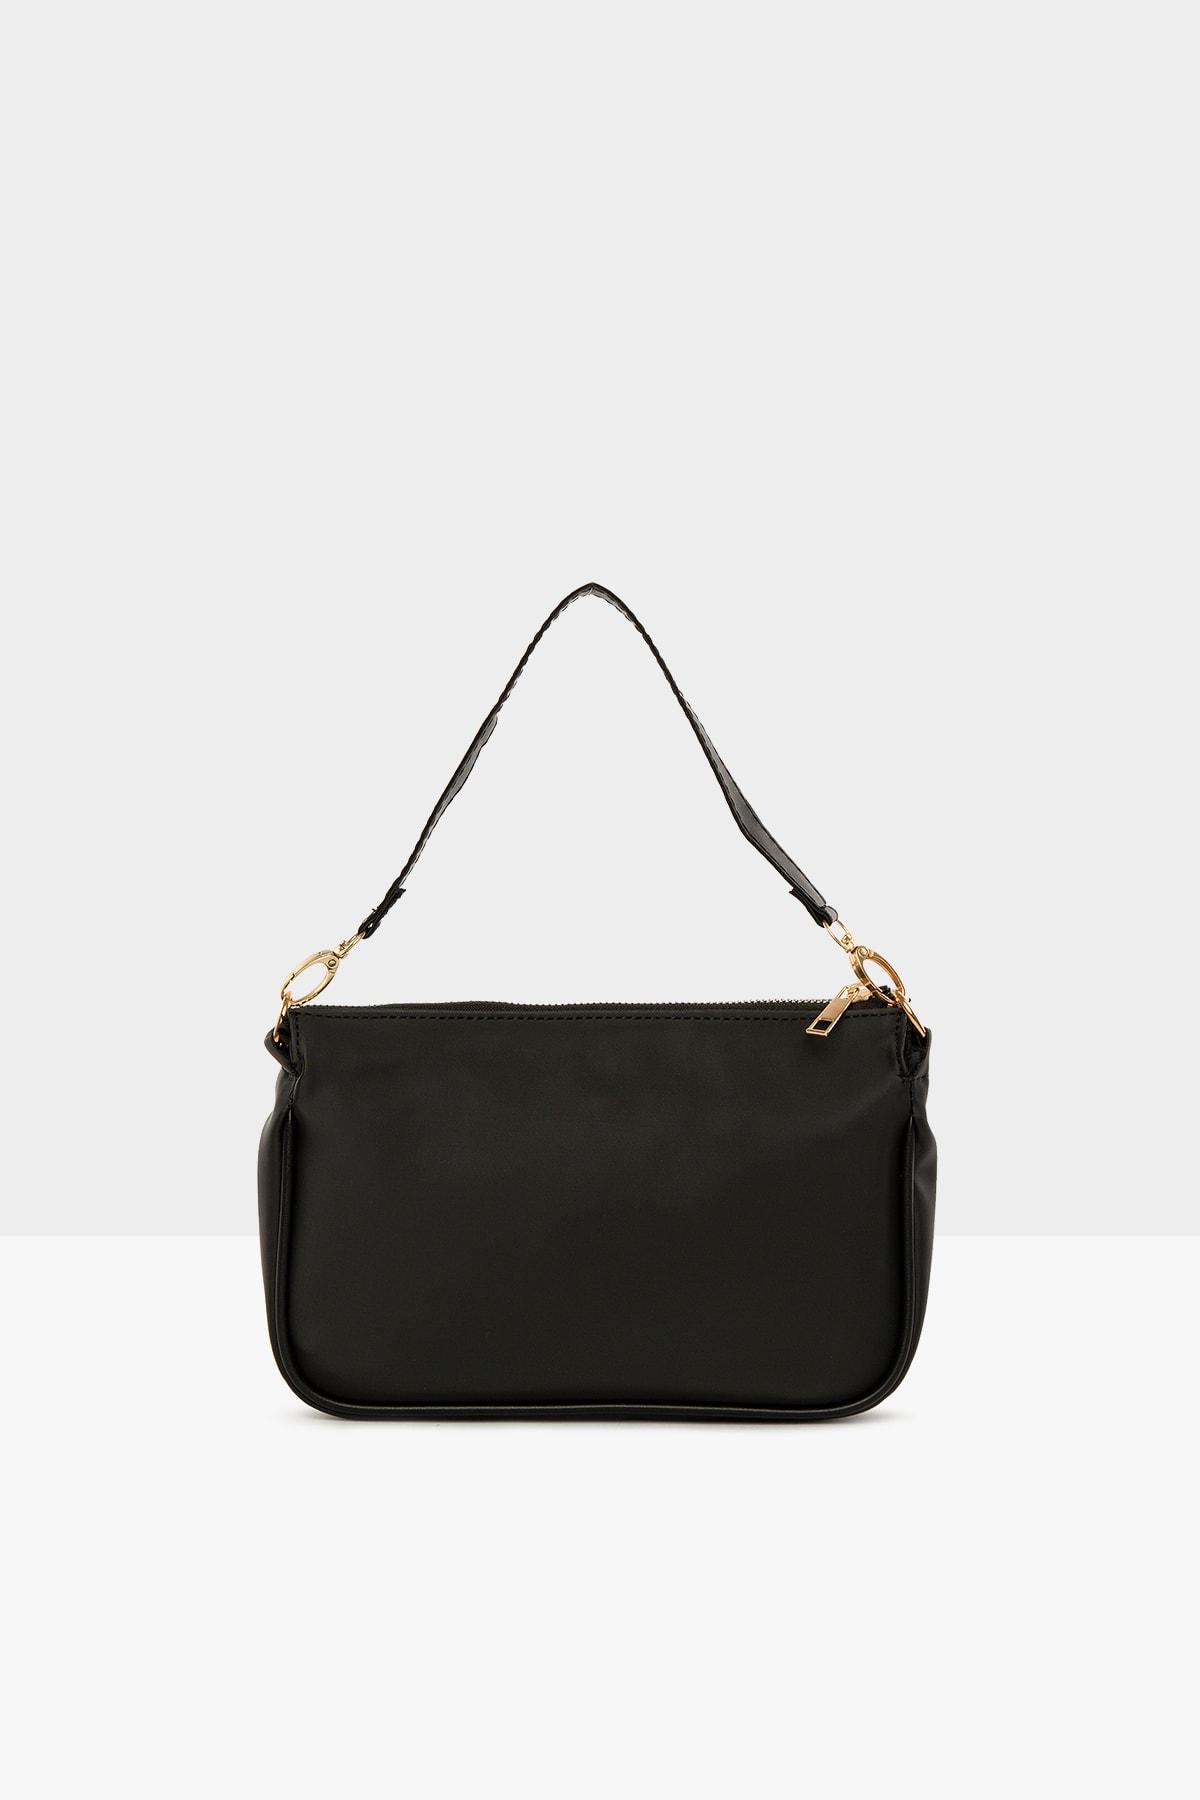 Bagmori Siyah Kadın Saten Fitilli Baget Çanta M000004464 1